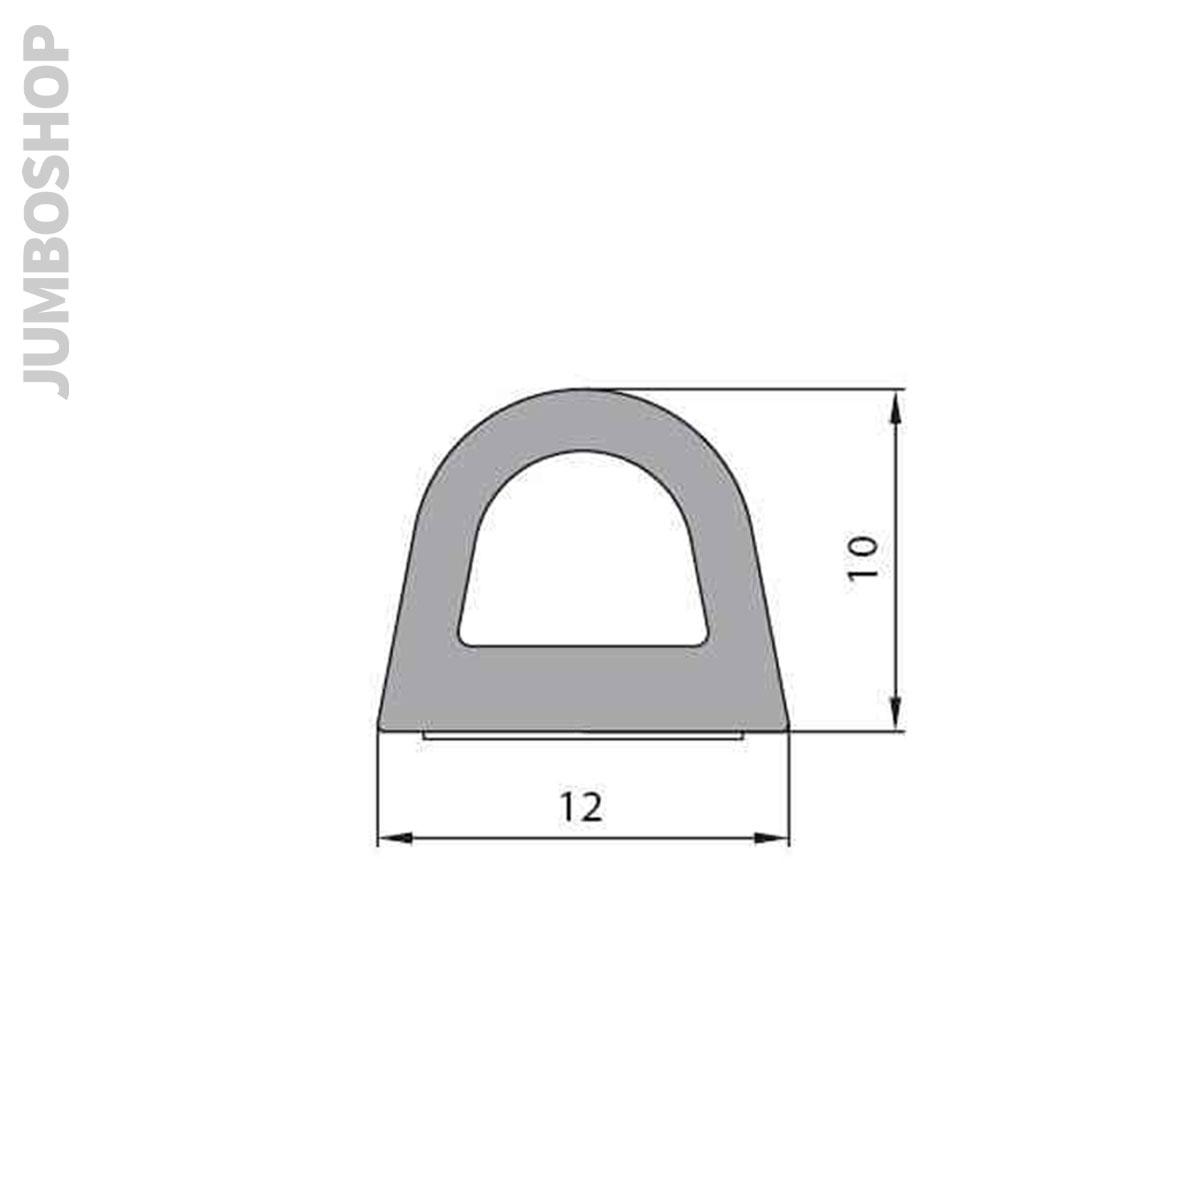 1m-Gummidichtung-Gummiprofil-Tuerdichtung-selbstklebend-Hohlkammerprofil-Moos